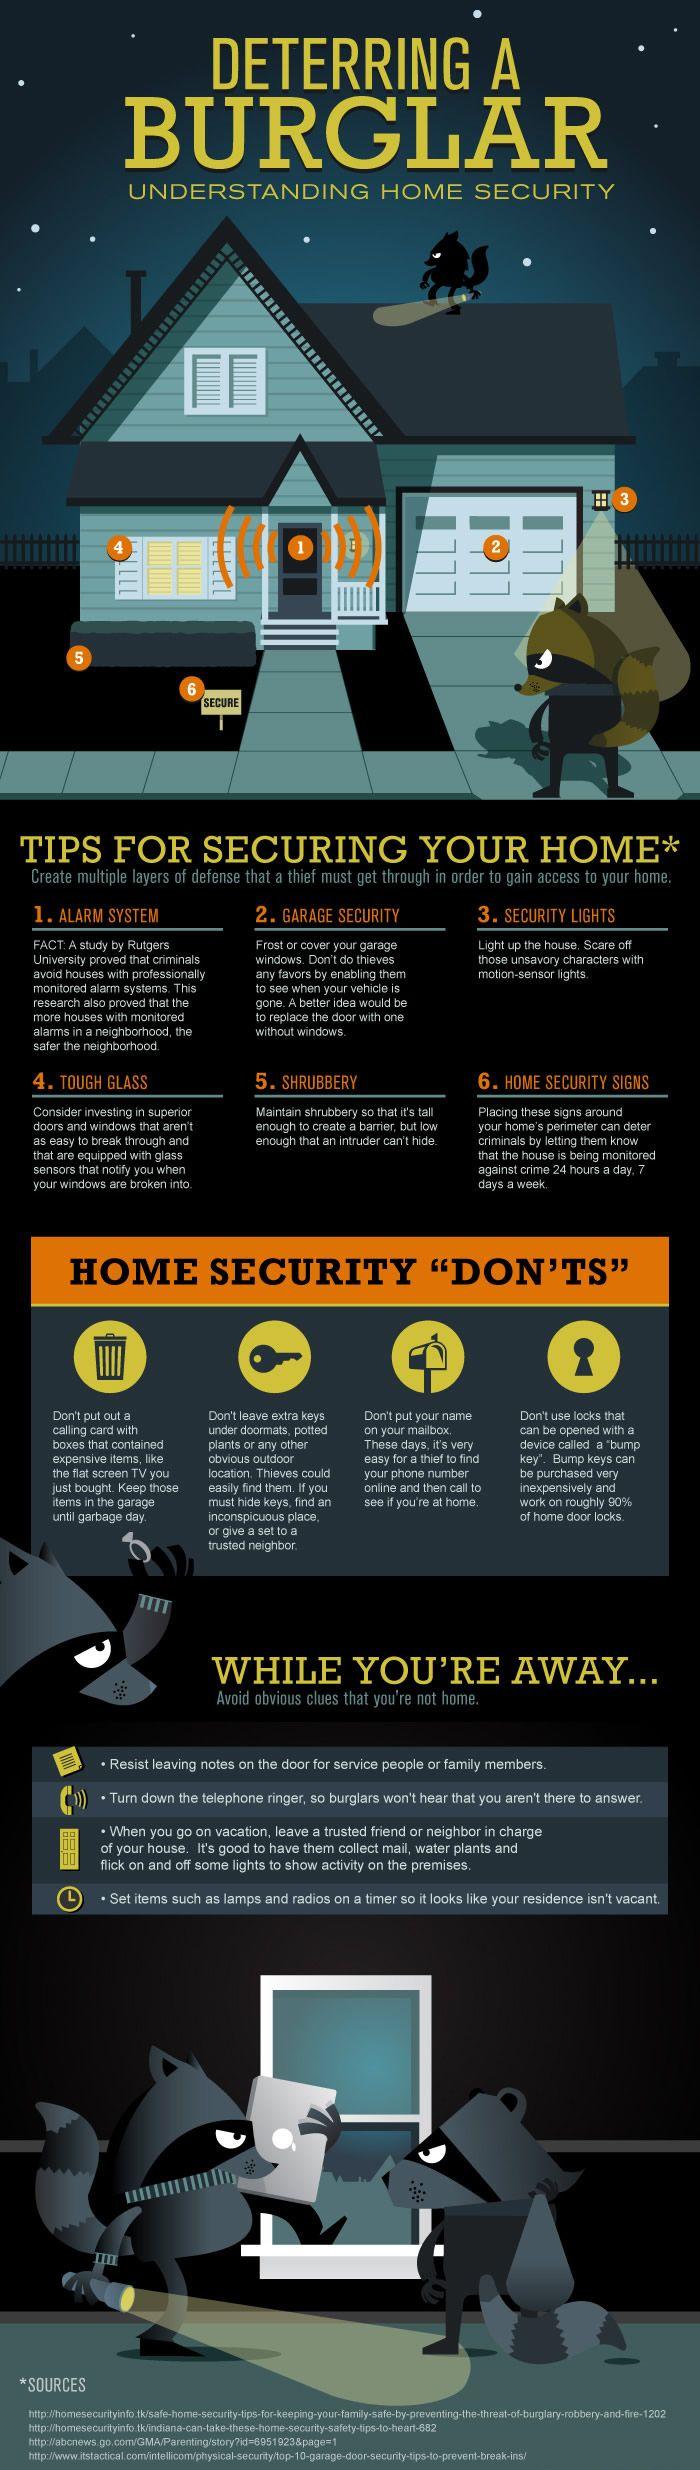 How To Prevent Burglary? - INFOGRAPHIC